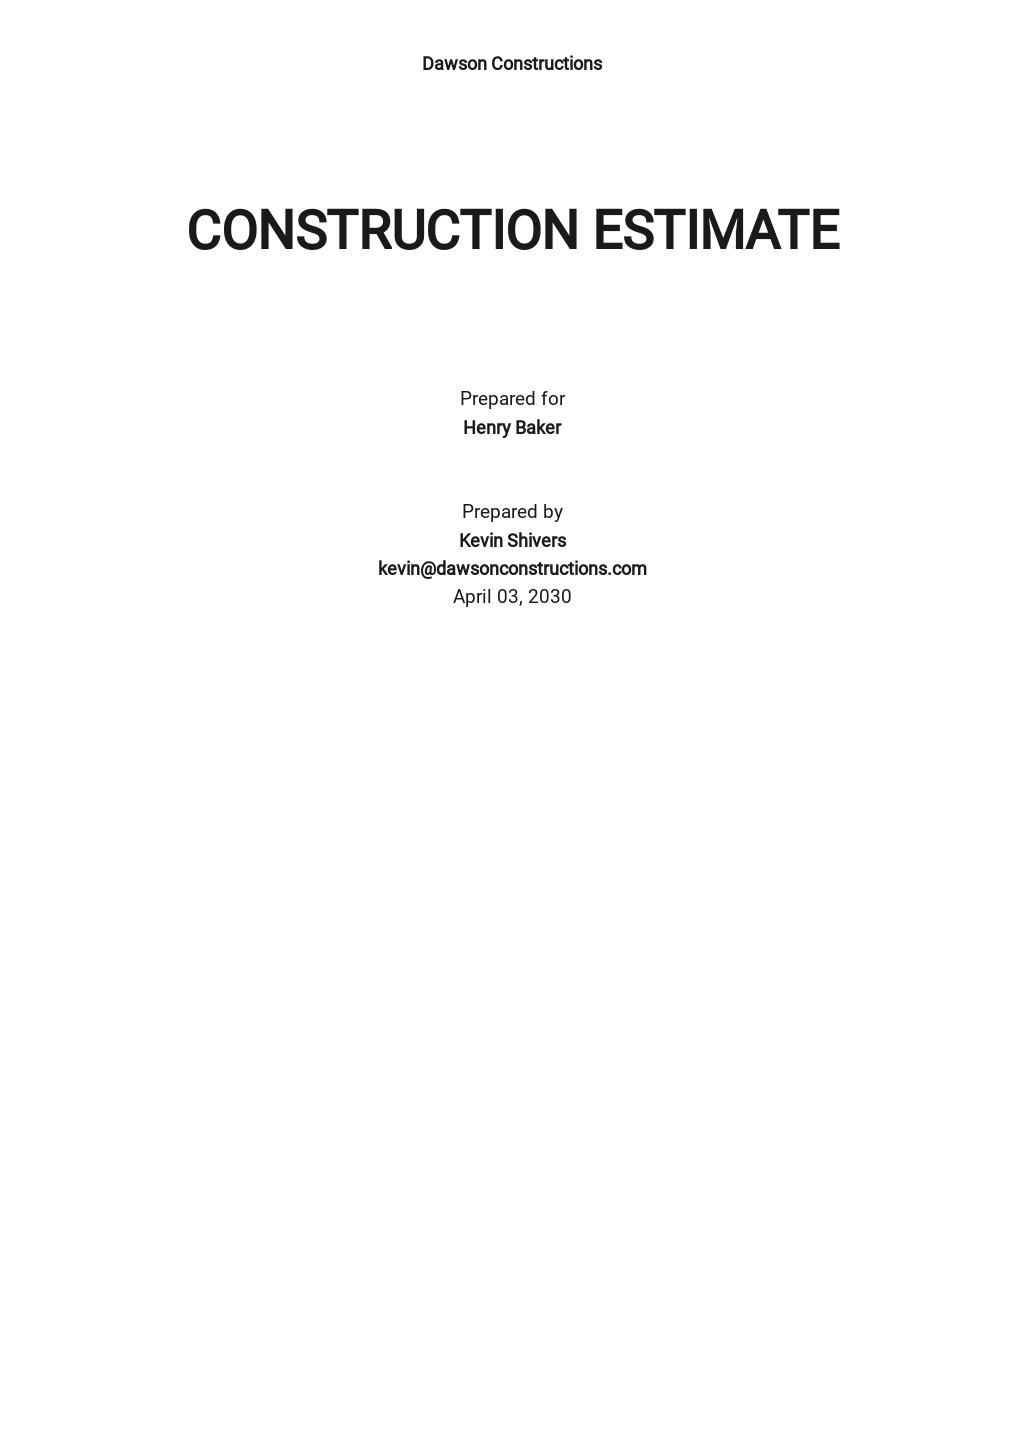 Blank Construction Estimate Template